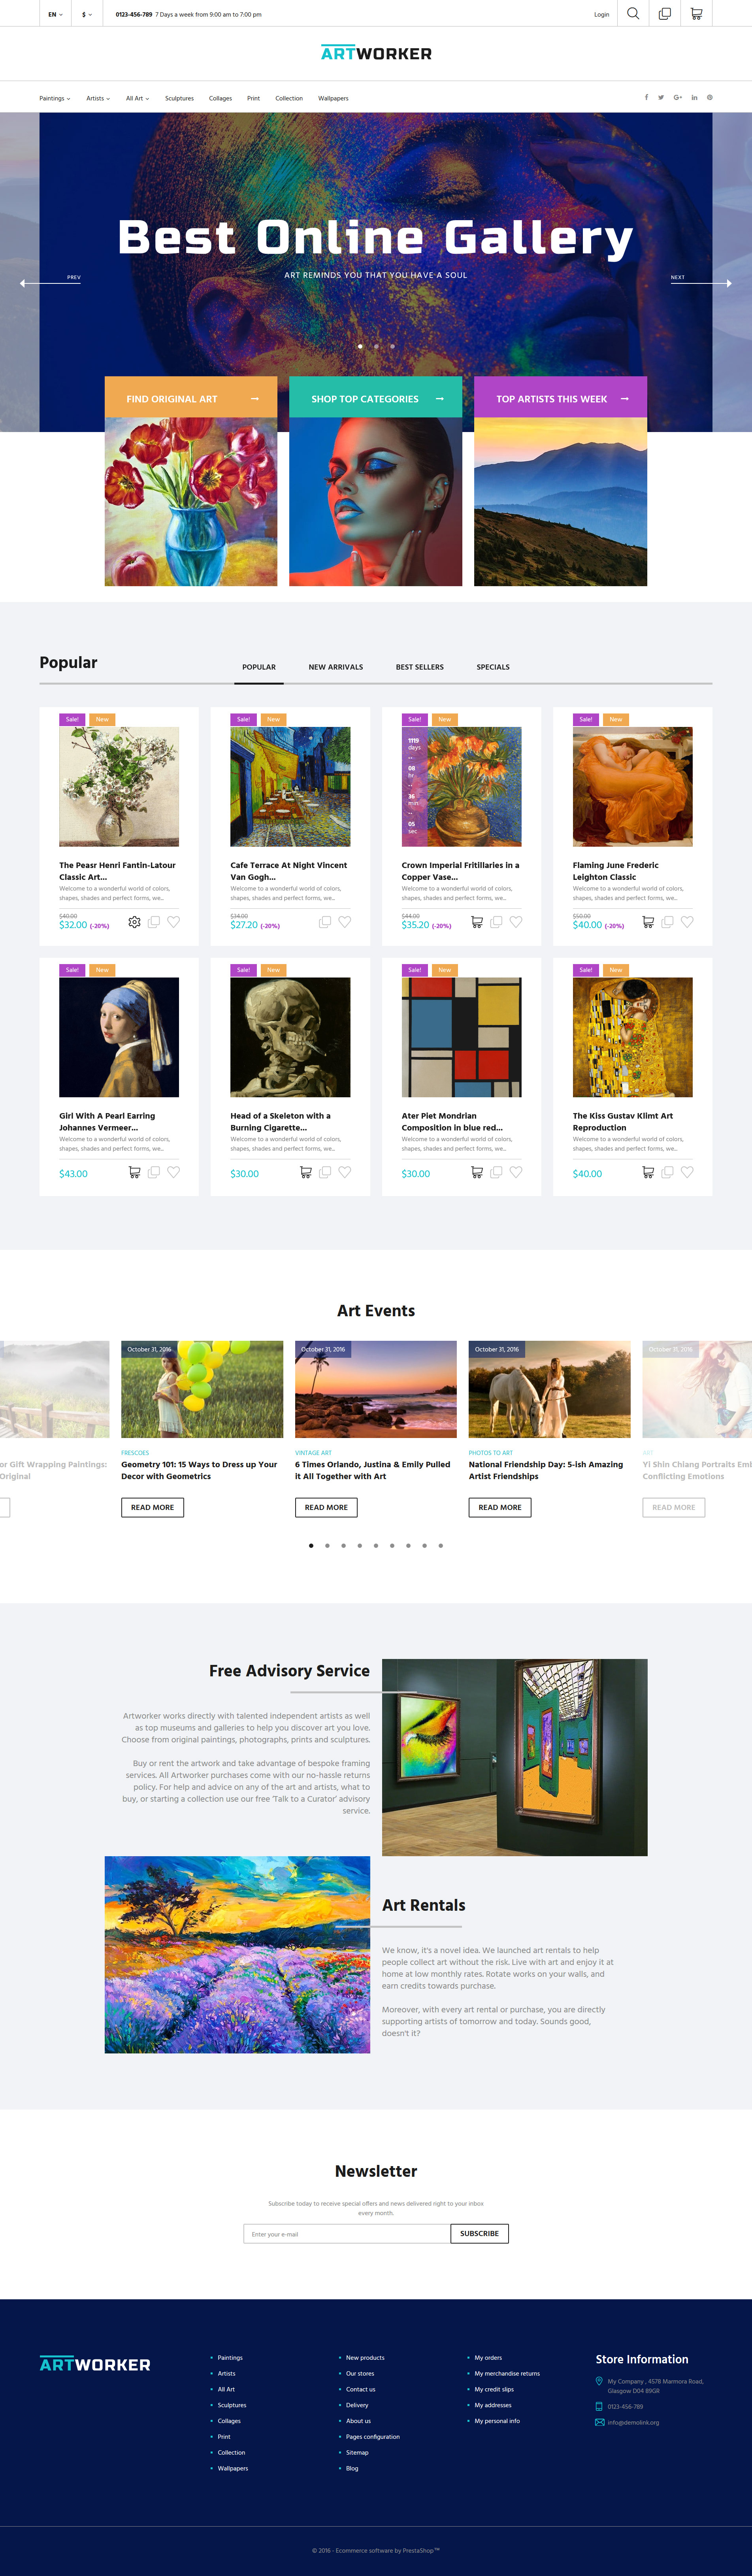 ArtWorker Online Gallery PrestaShop Theme Httpswww - Online art gallery website template